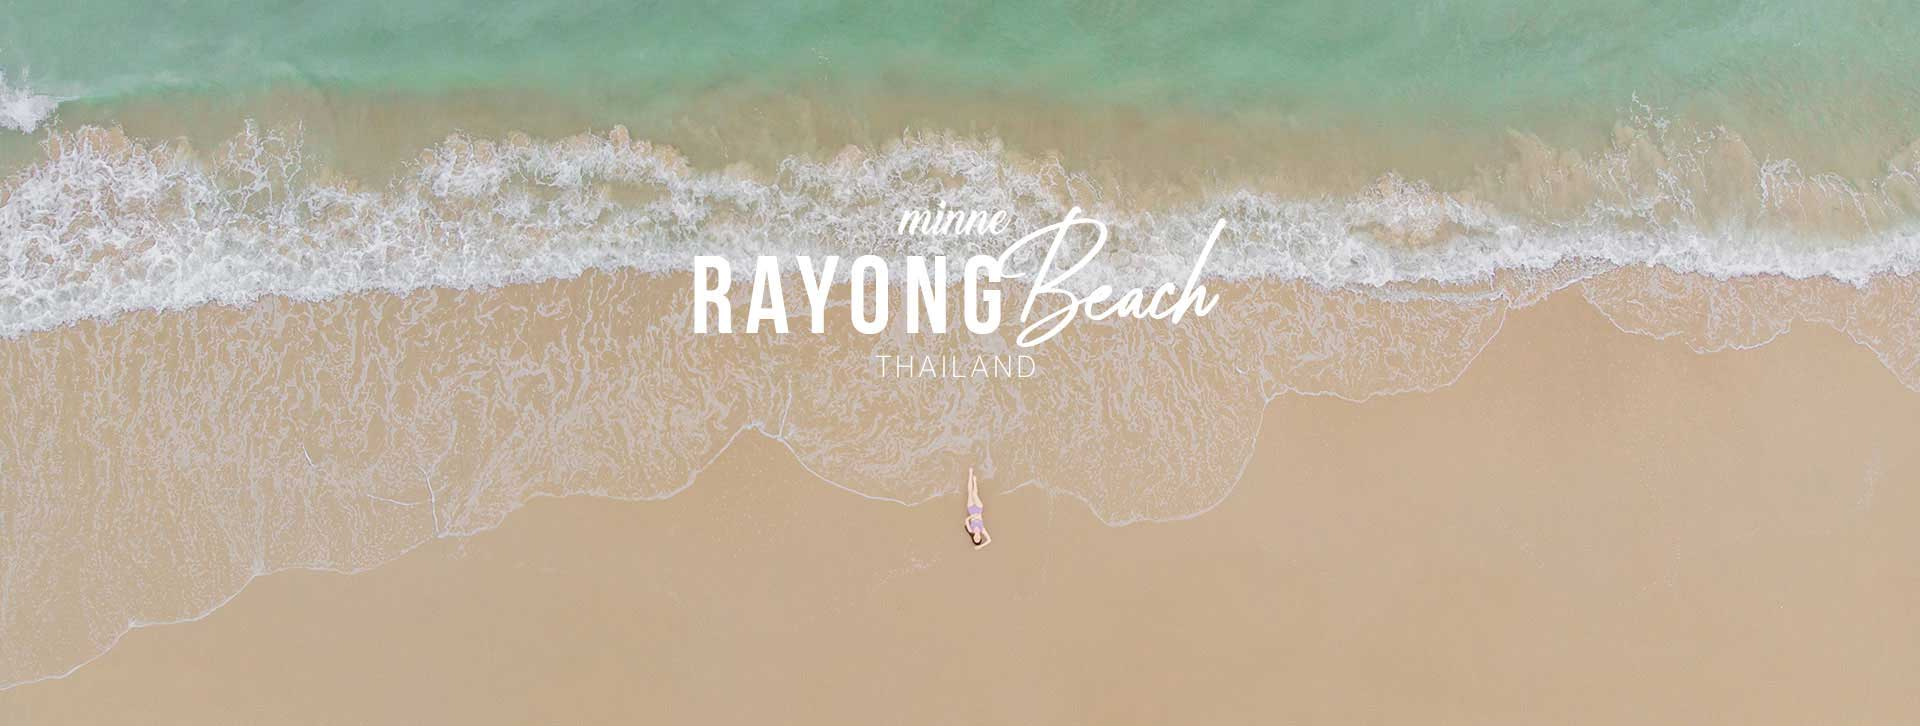 m rayong beach thailand with bikini long cover